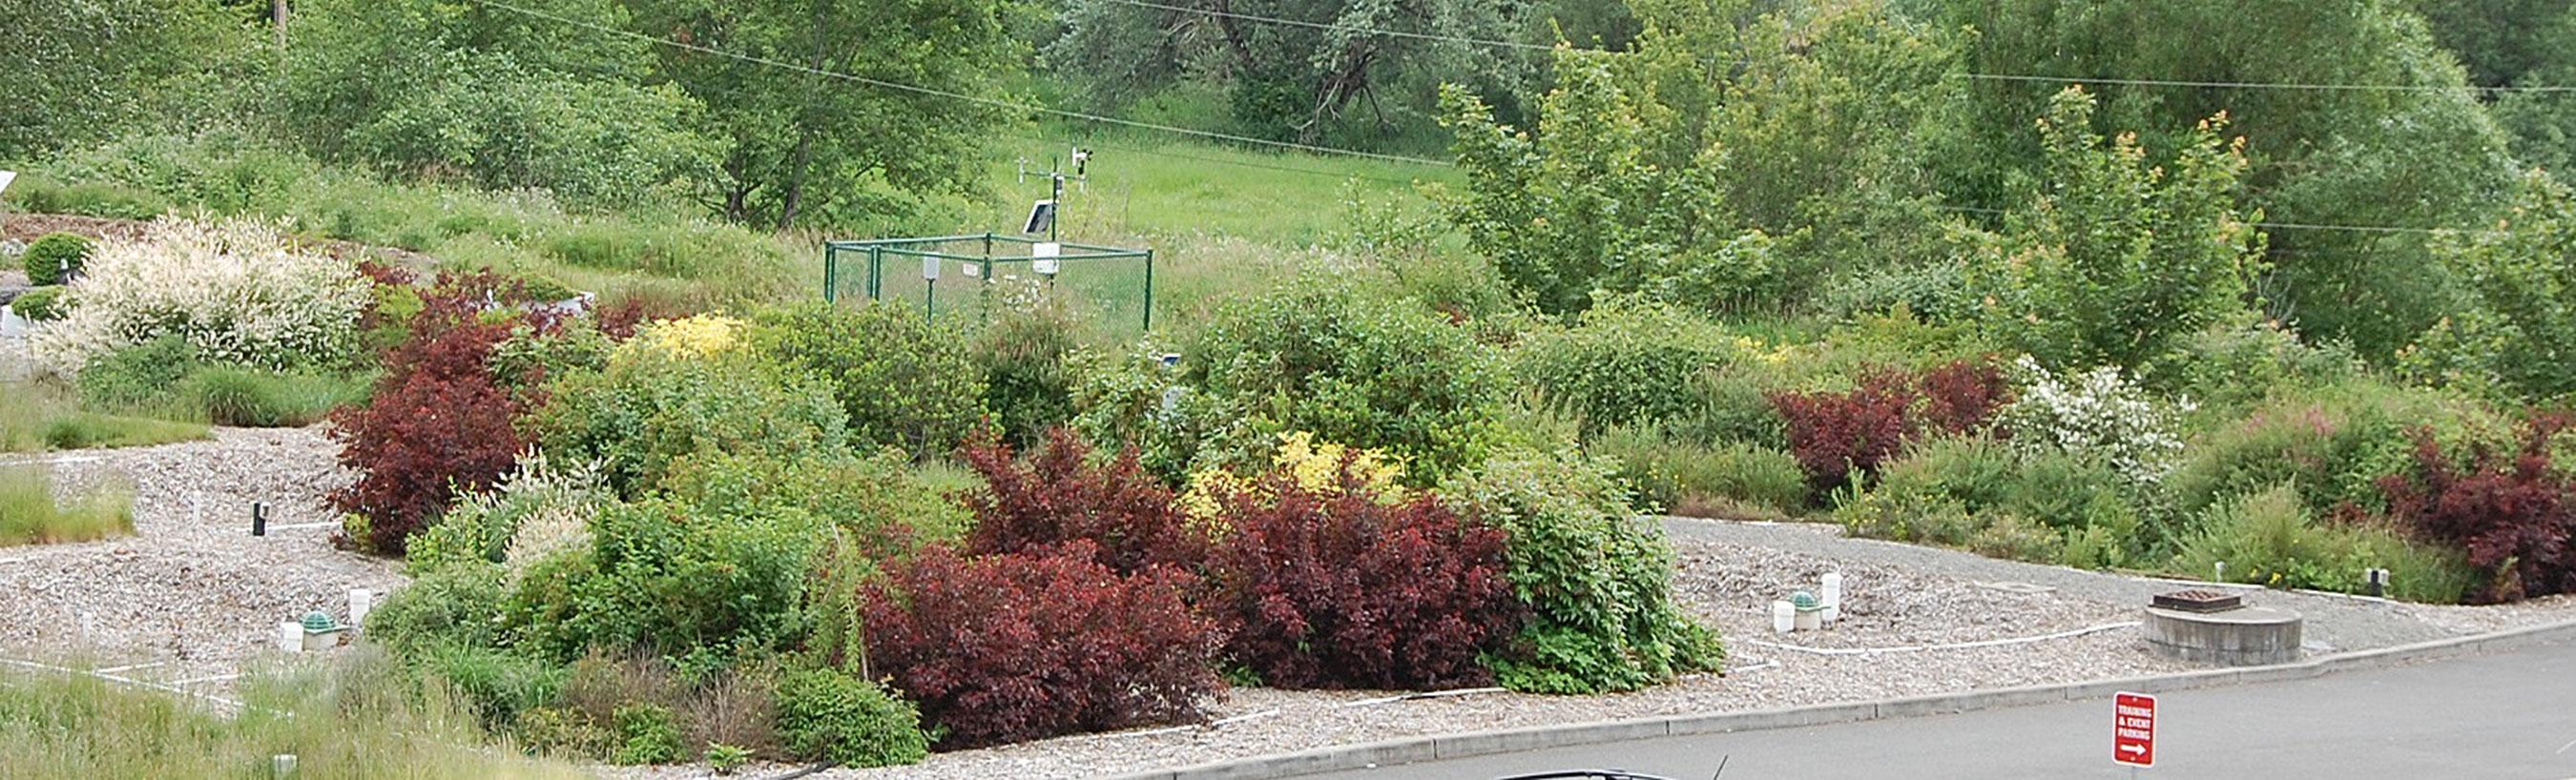 How does your rain garden grow best plants for northwest wsu how does your rain garden grow best plants for northwest publicscrutiny Images